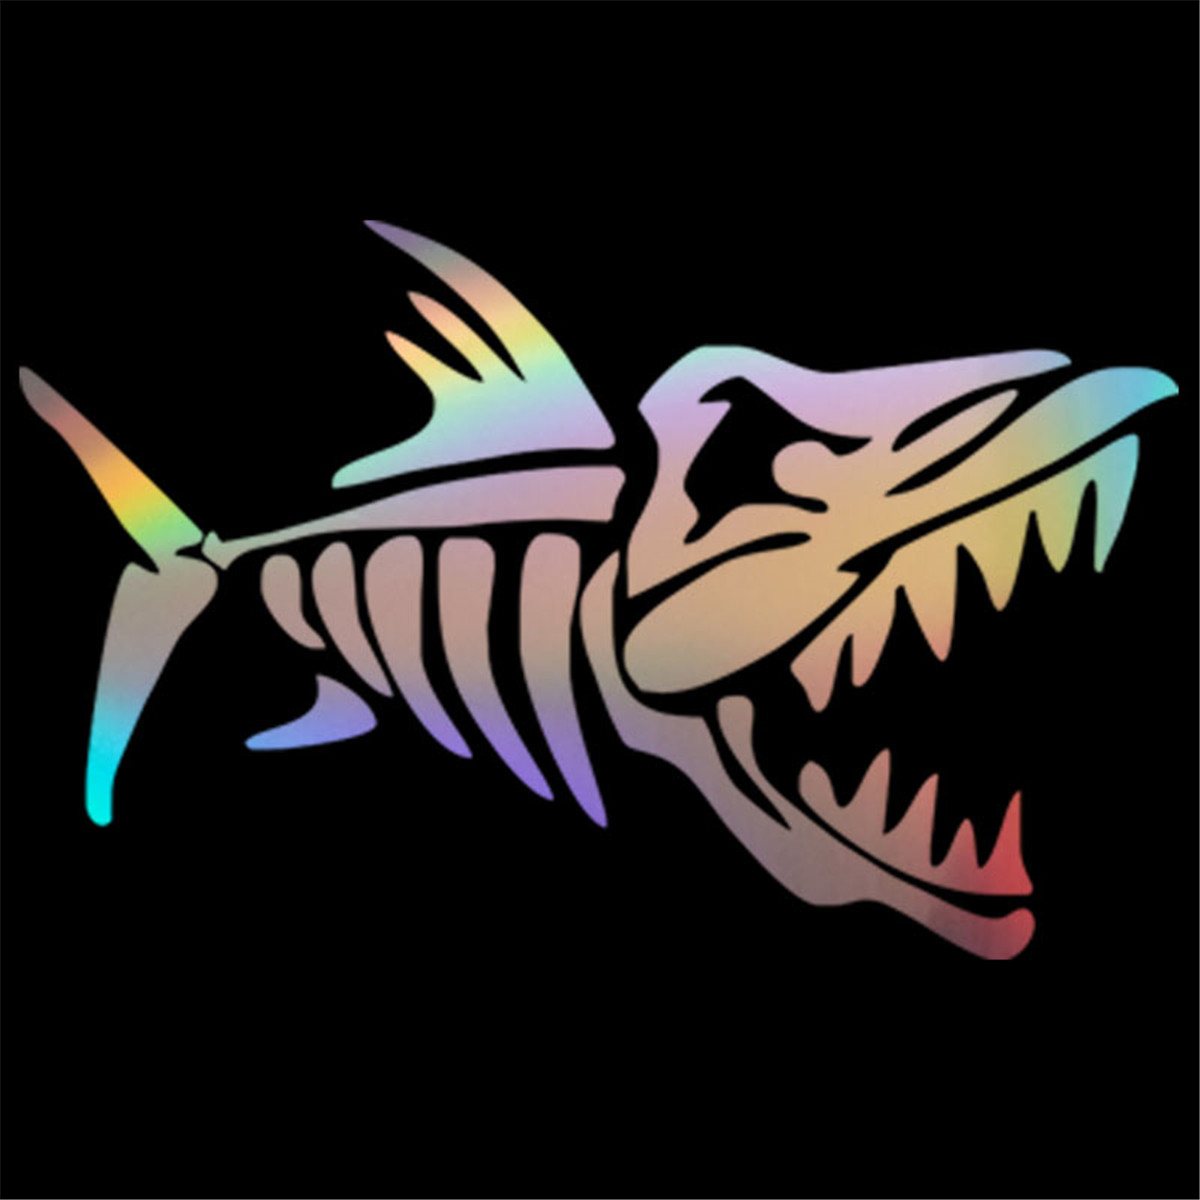 Shark Bone Sticker Car Auto Laptop Fishing Boat Truck Window Truck  Vinyl Decal